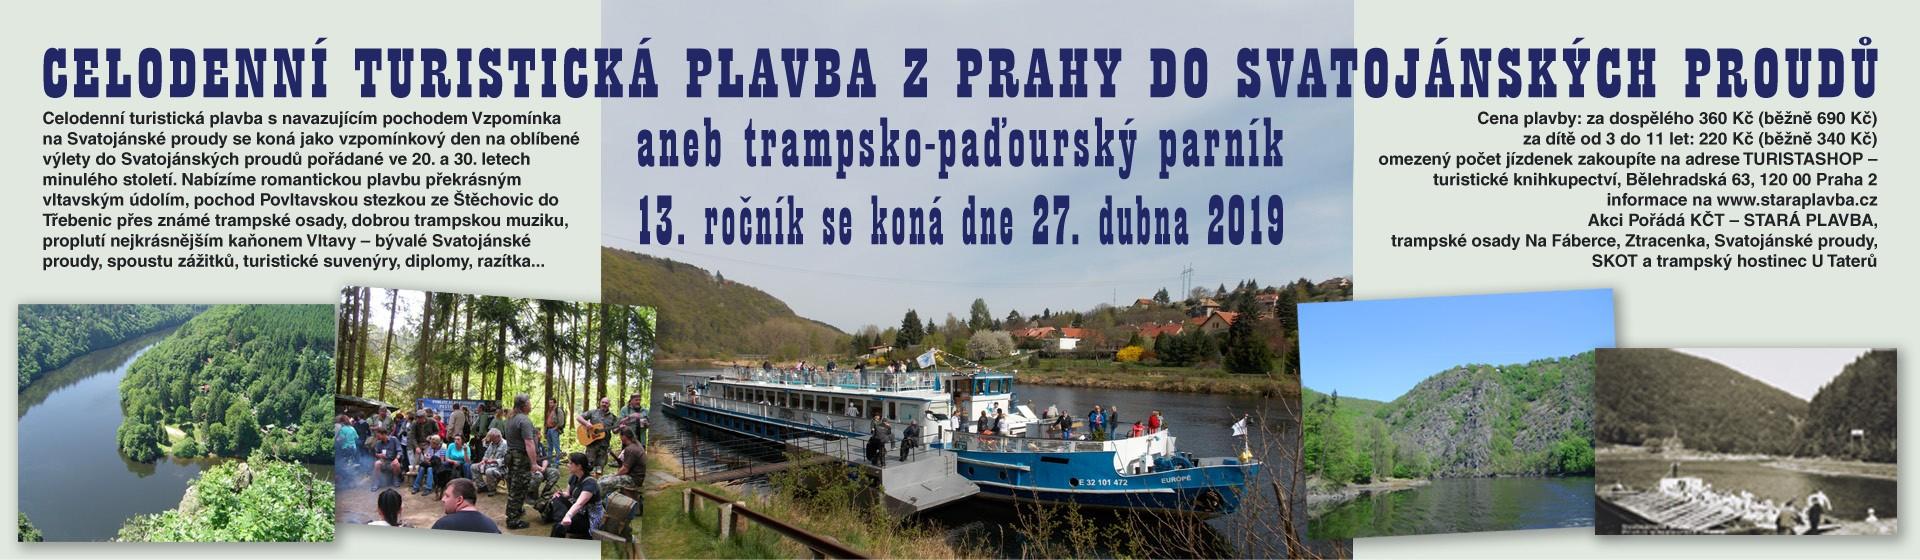 Turistická plavba Z Prahy do Svatojánských proudů aneb trampsko-paďourský parník 27. 4. 2019 - 13. ročník